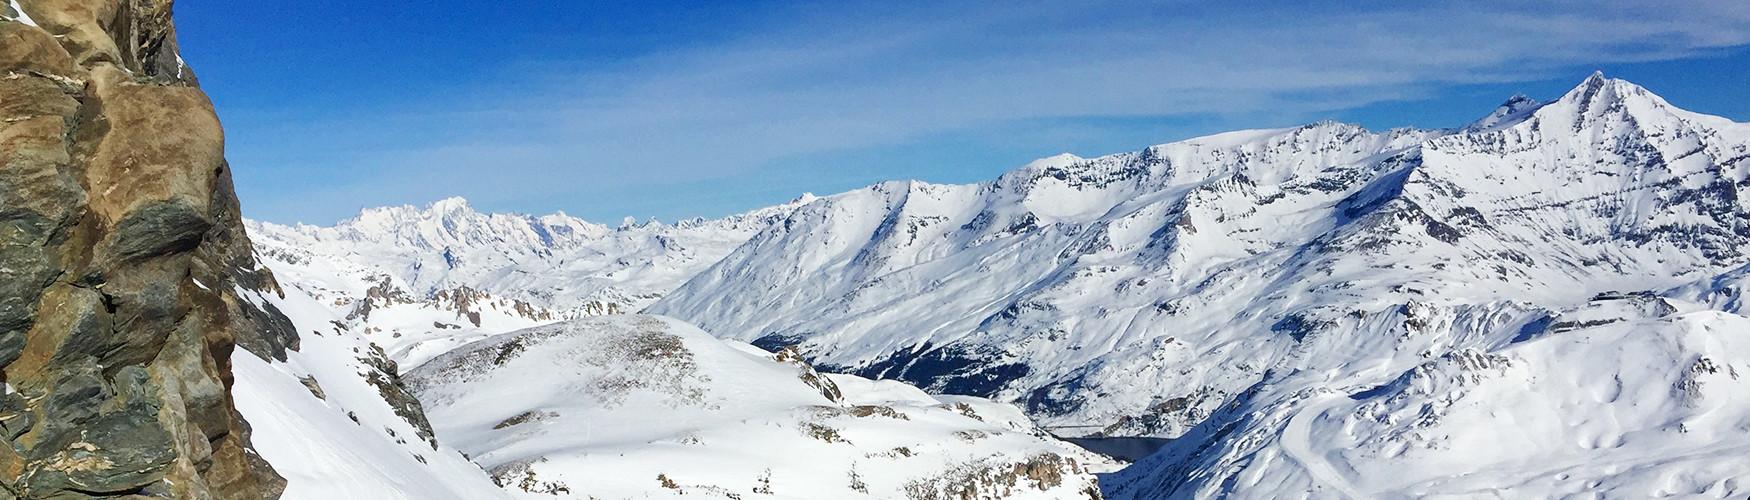 Freeride Val-Isere Frankreich